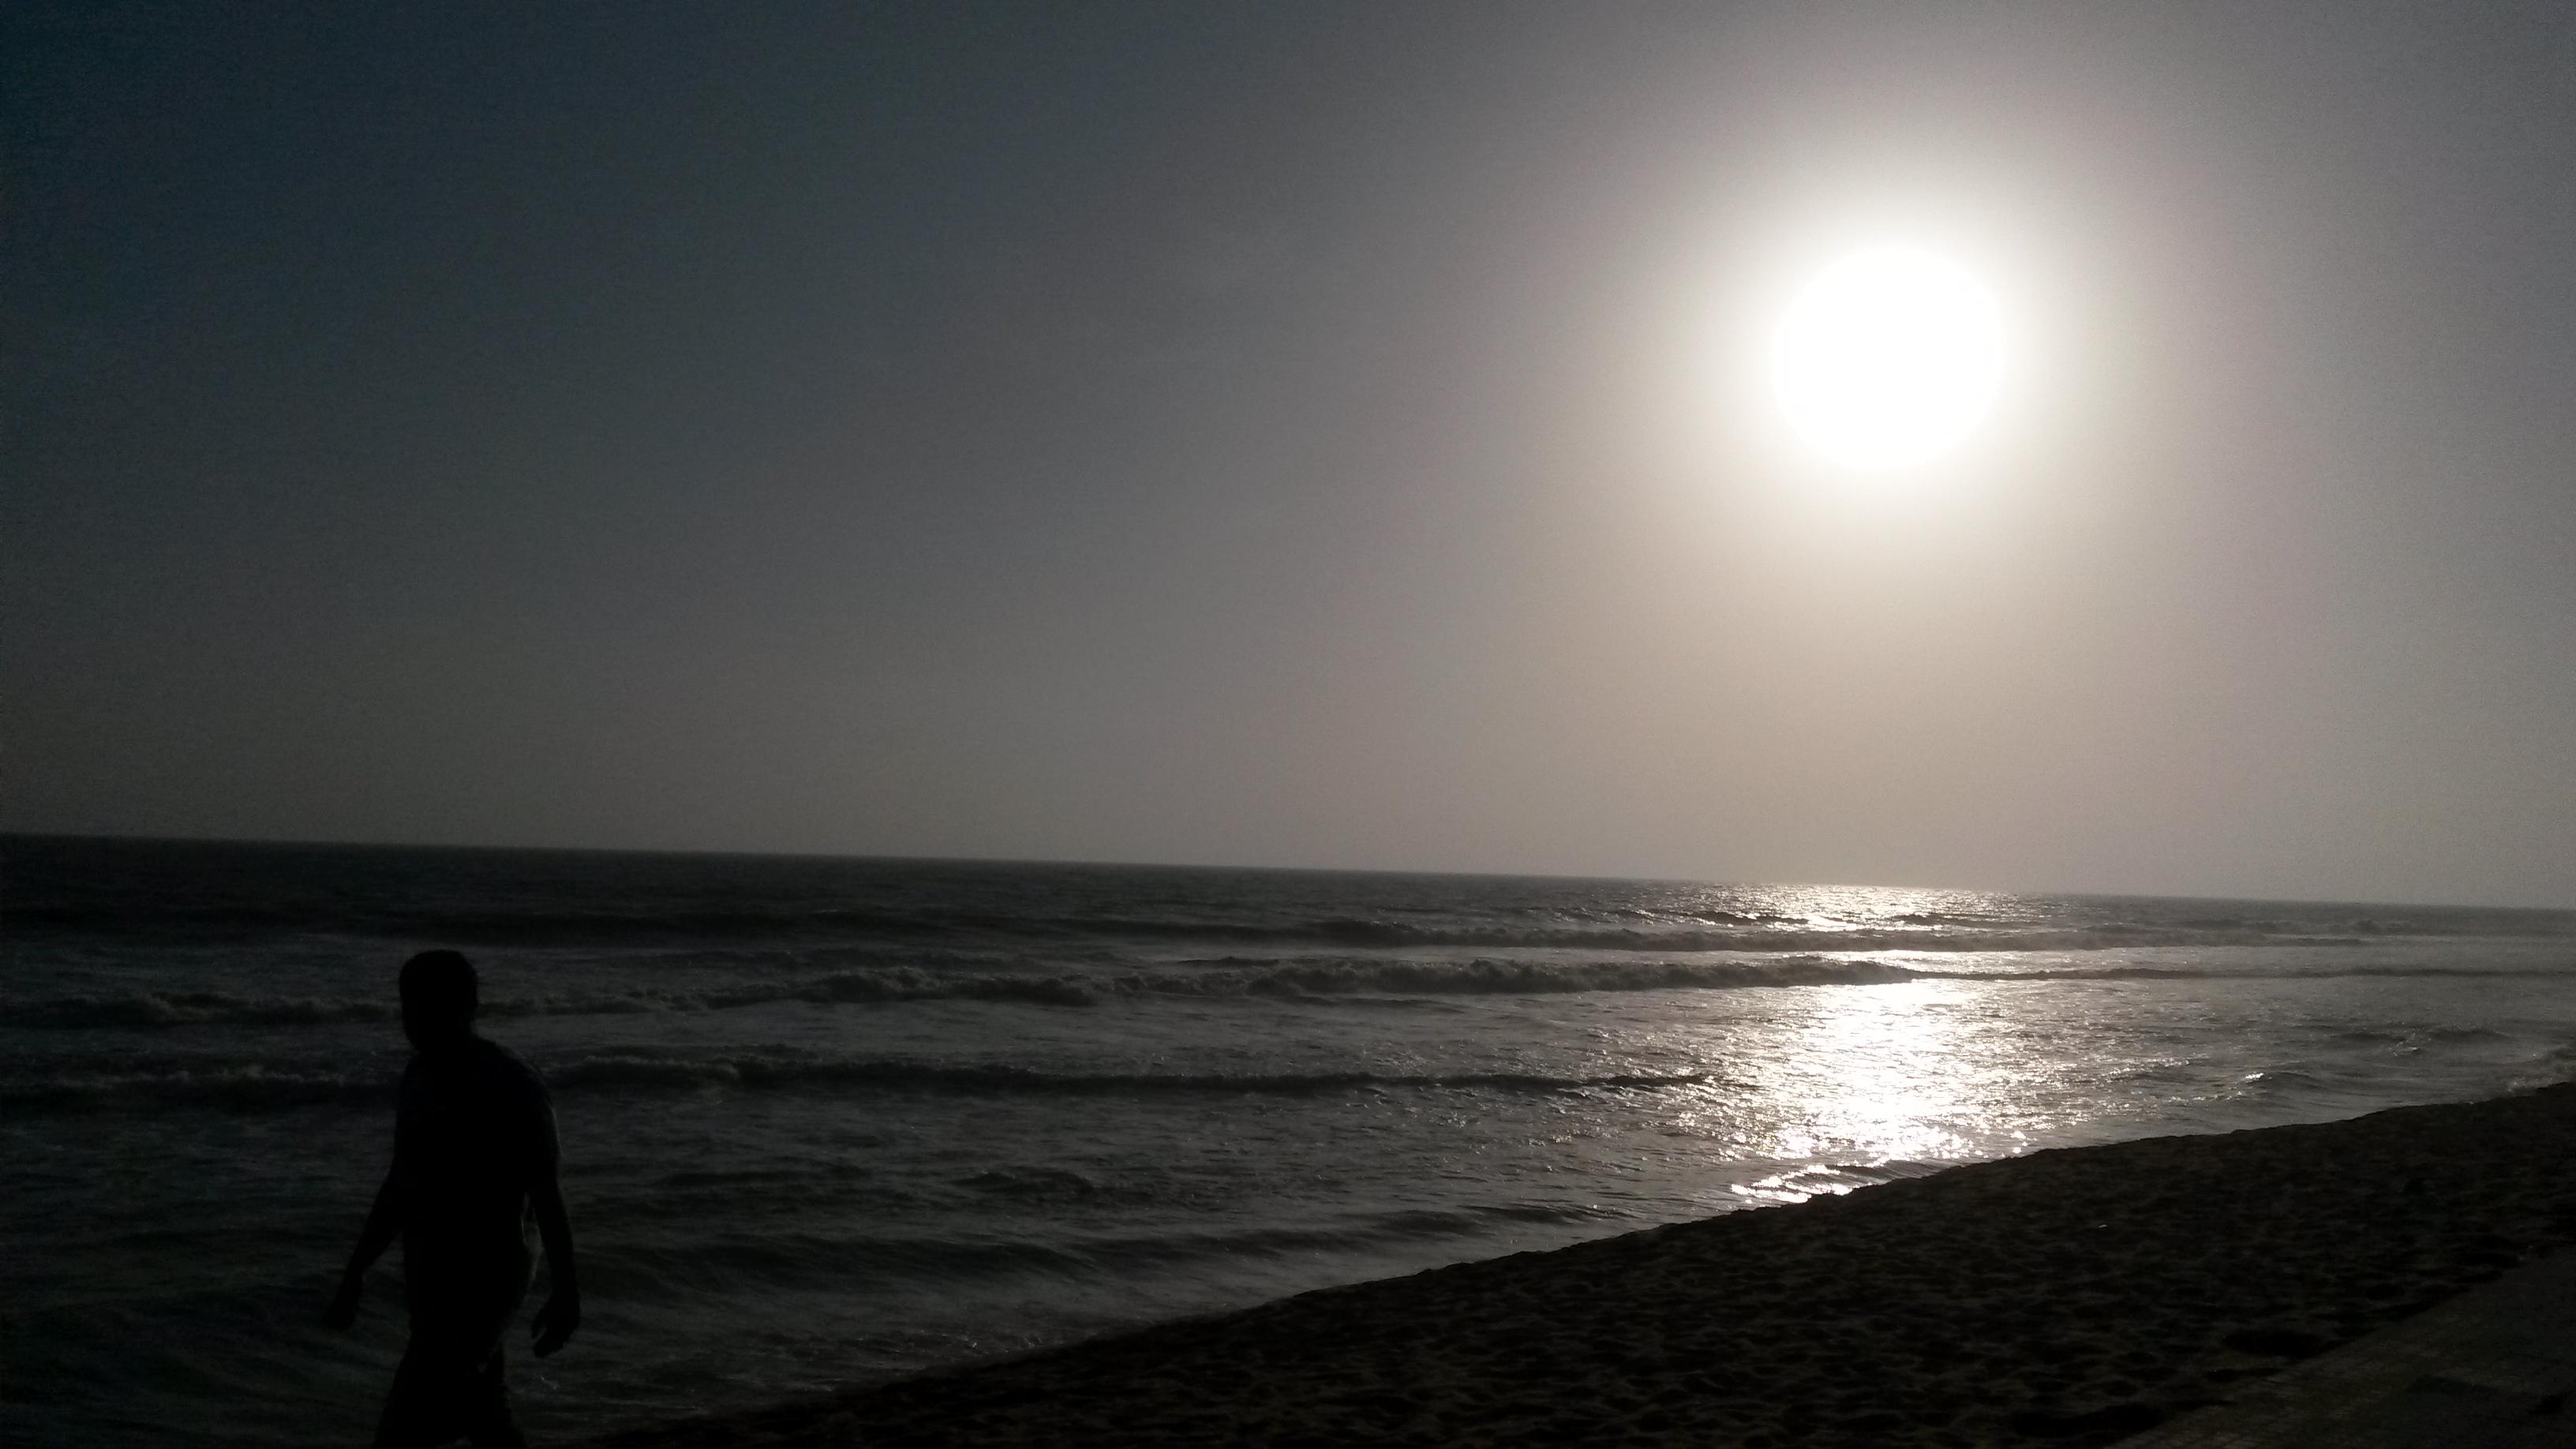 A sun in beach photo